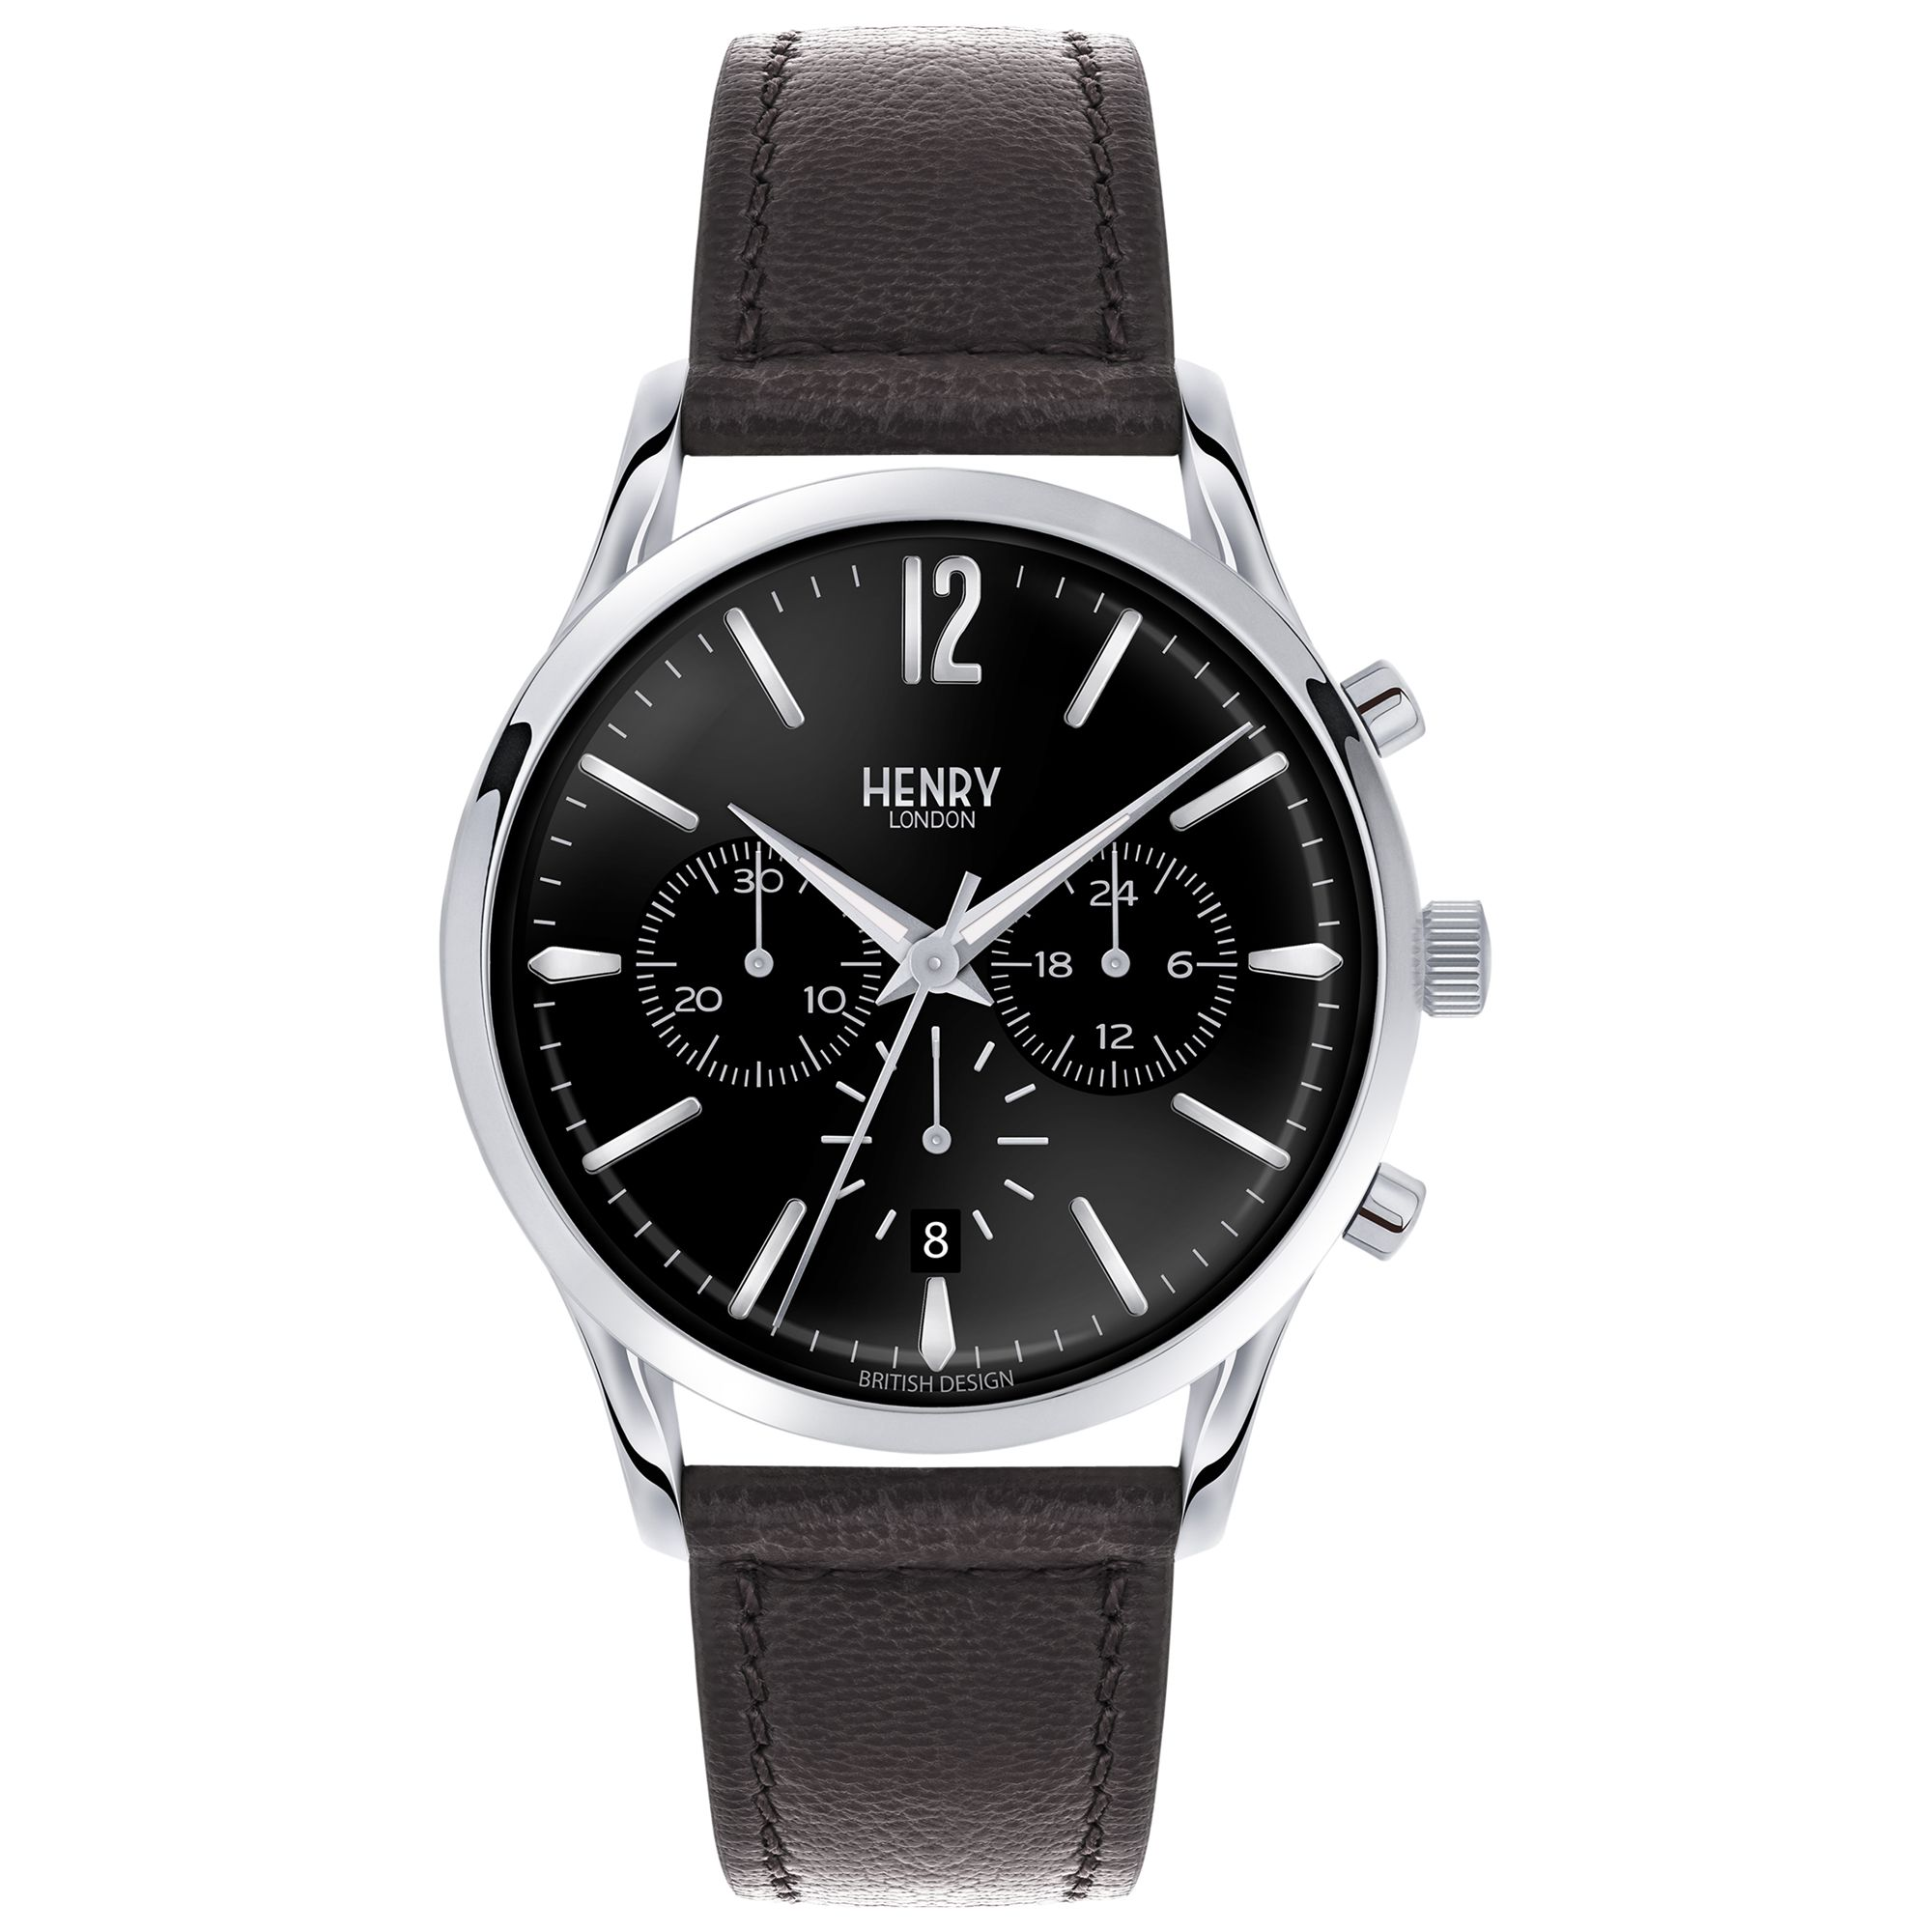 Henry London Henry London HL41-CS-0023 Men's Edgware Chronograph Date Leather Strap Watch, Black